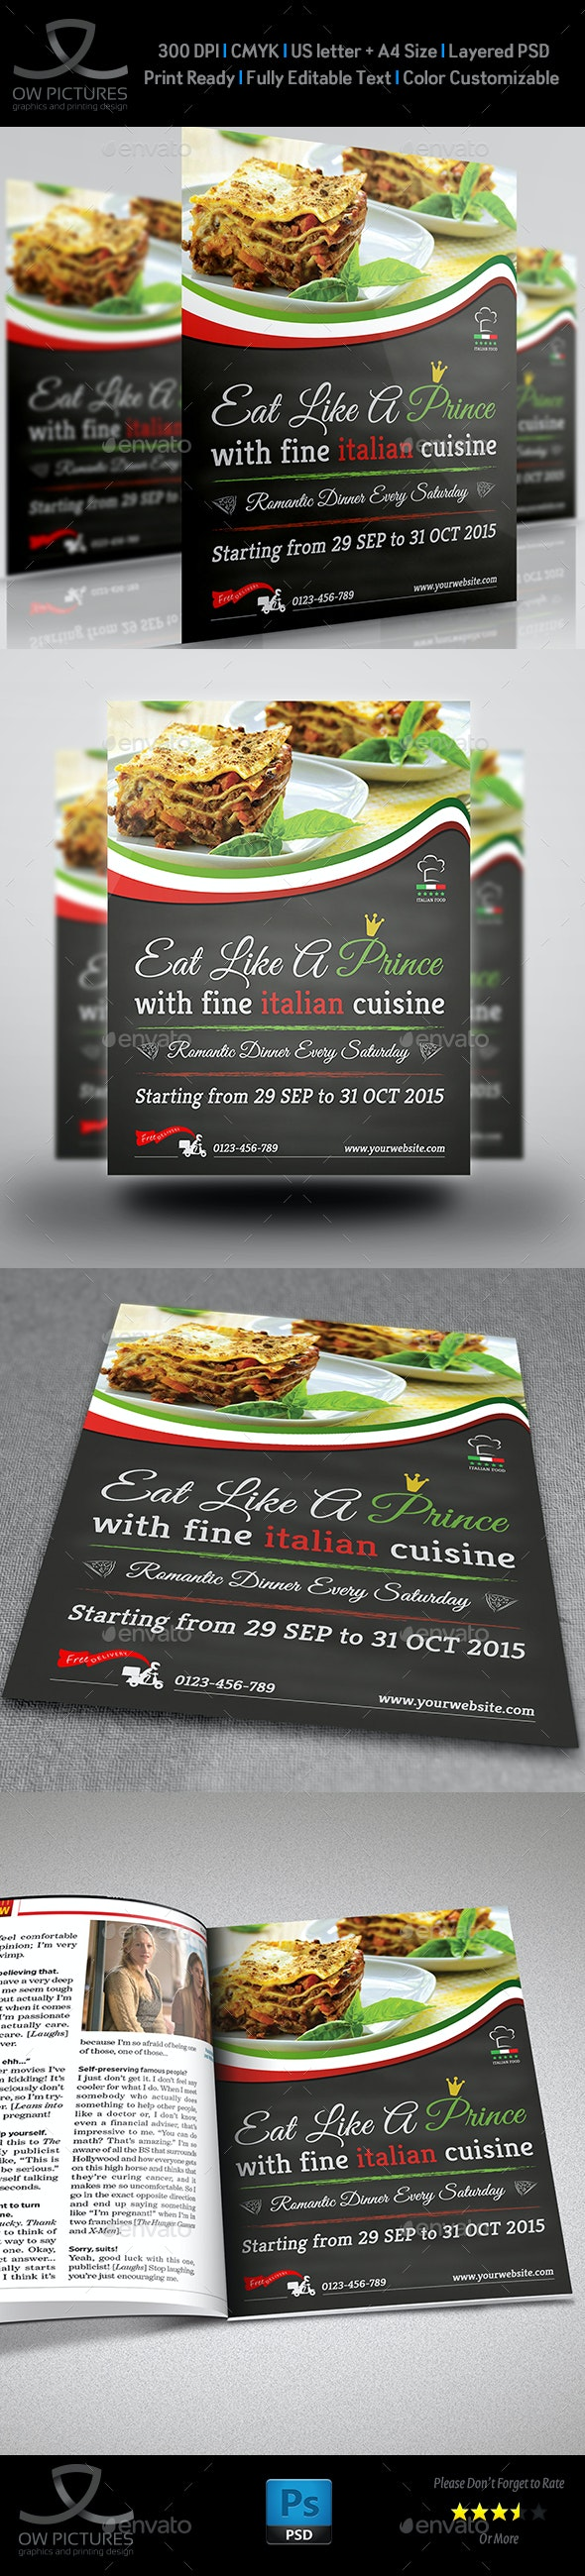 Italian Food Restaurant Flyer Vol.2 - Restaurant Flyers